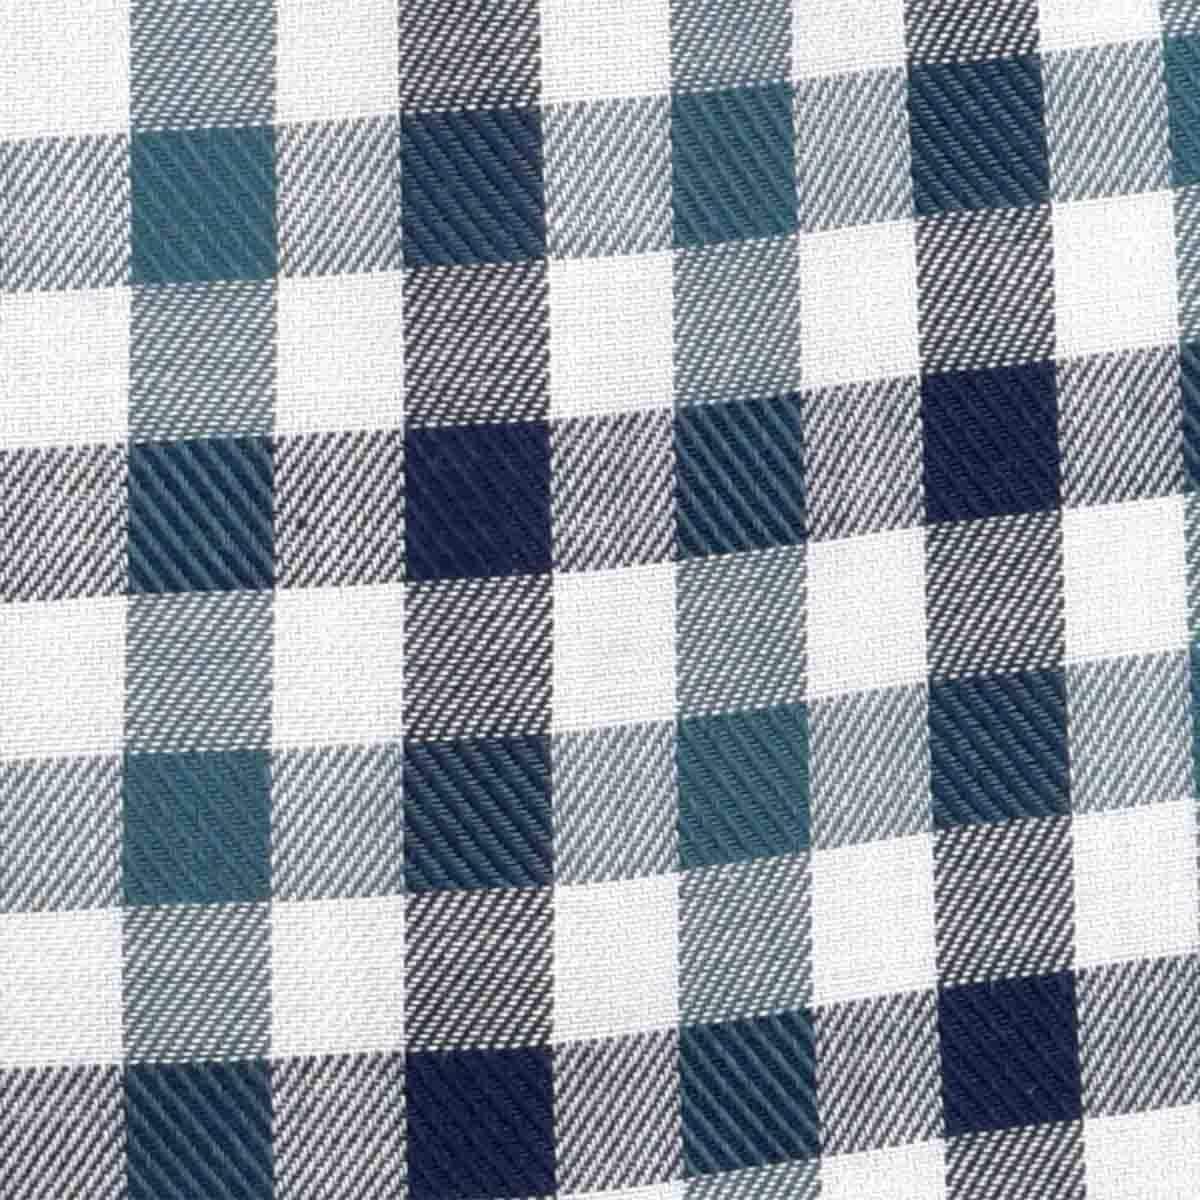 Camisa Manga Larga Casual Cuadros Verde Carlo Corinto para Caballero